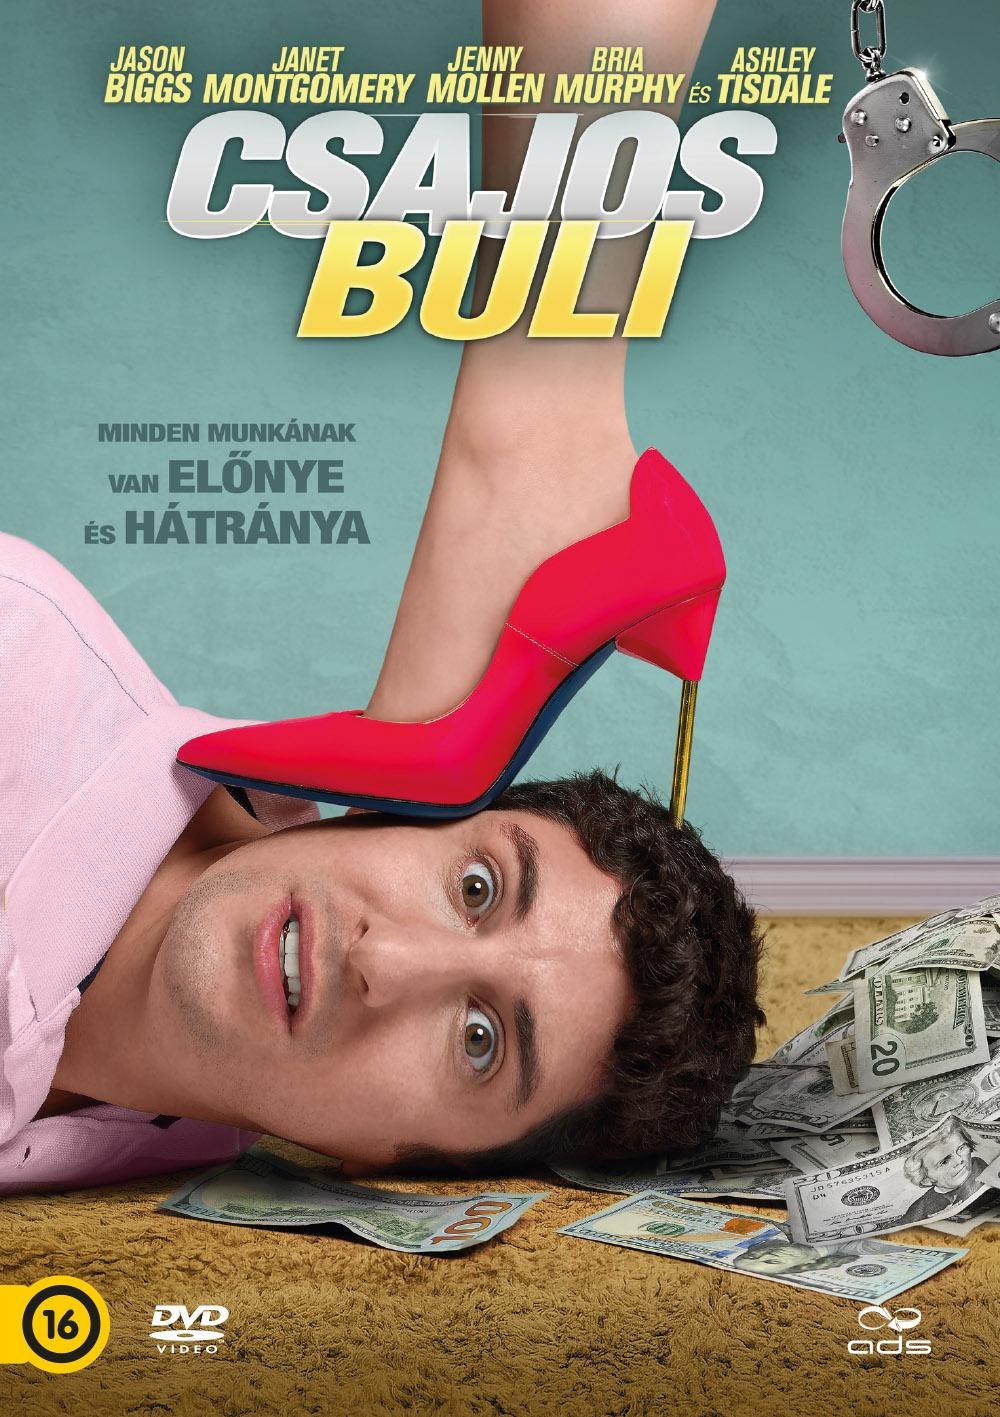 CSAJOS BULI - DVD -